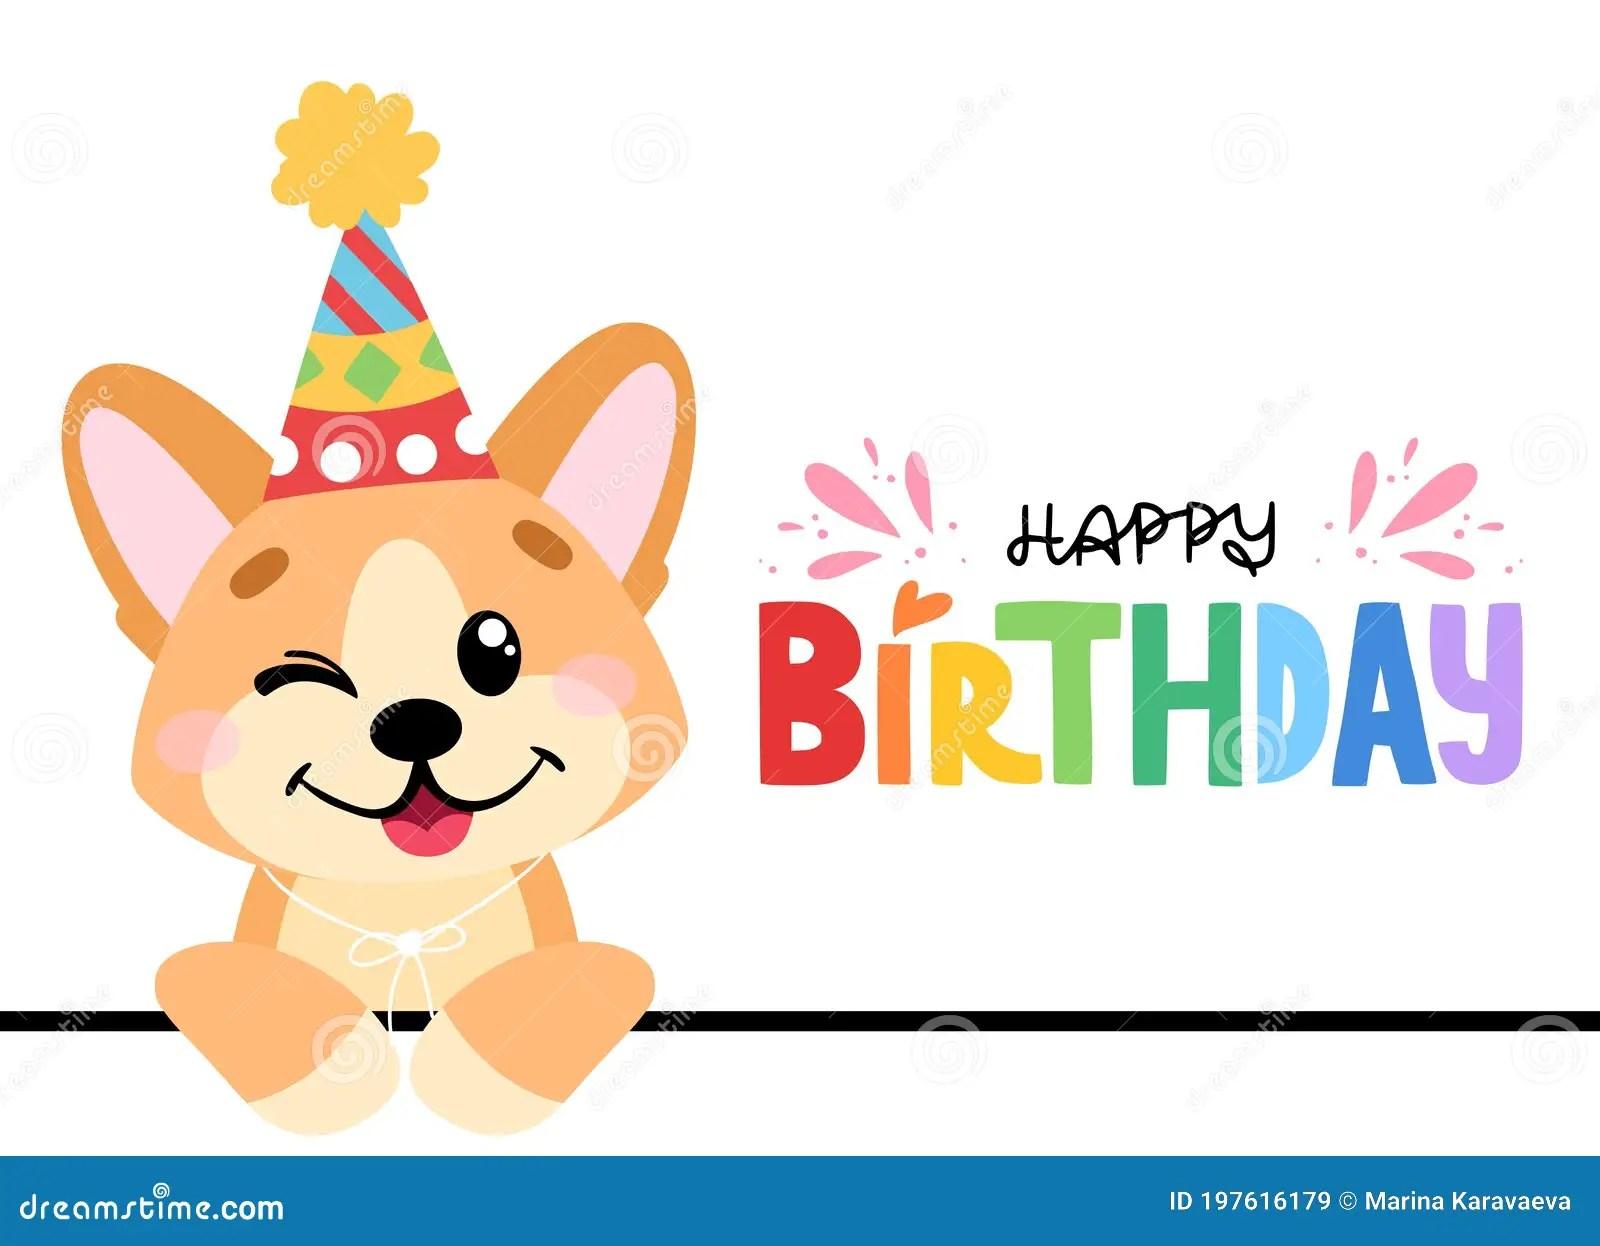 Happy Birthday Corgi Stock Illustrations 100 Happy Birthday Corgi Stock Illustrations Vectors Clipart Dreamstime